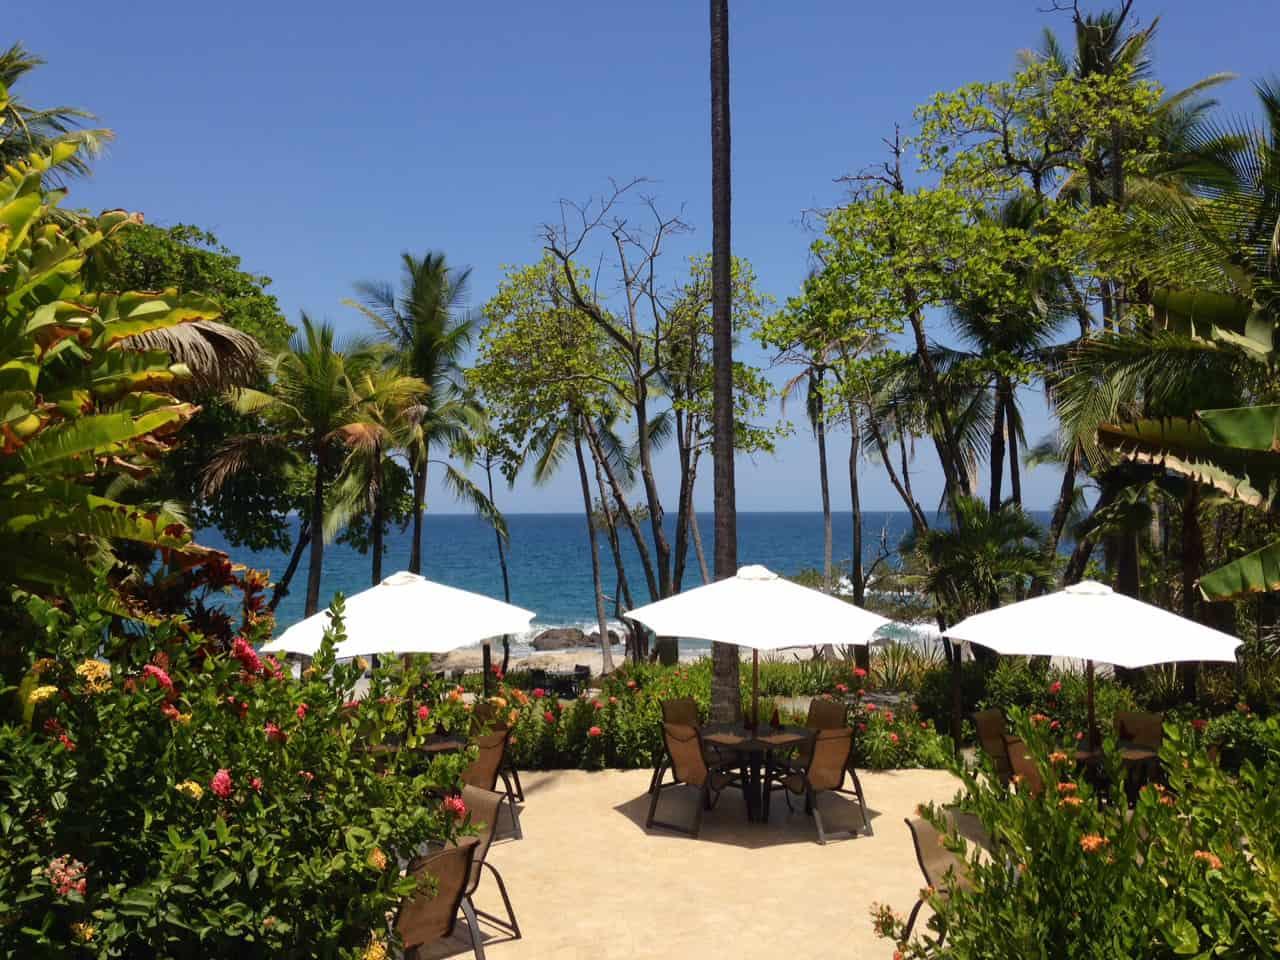 Oceanfront patio at Ylang Ylang Beach Resort